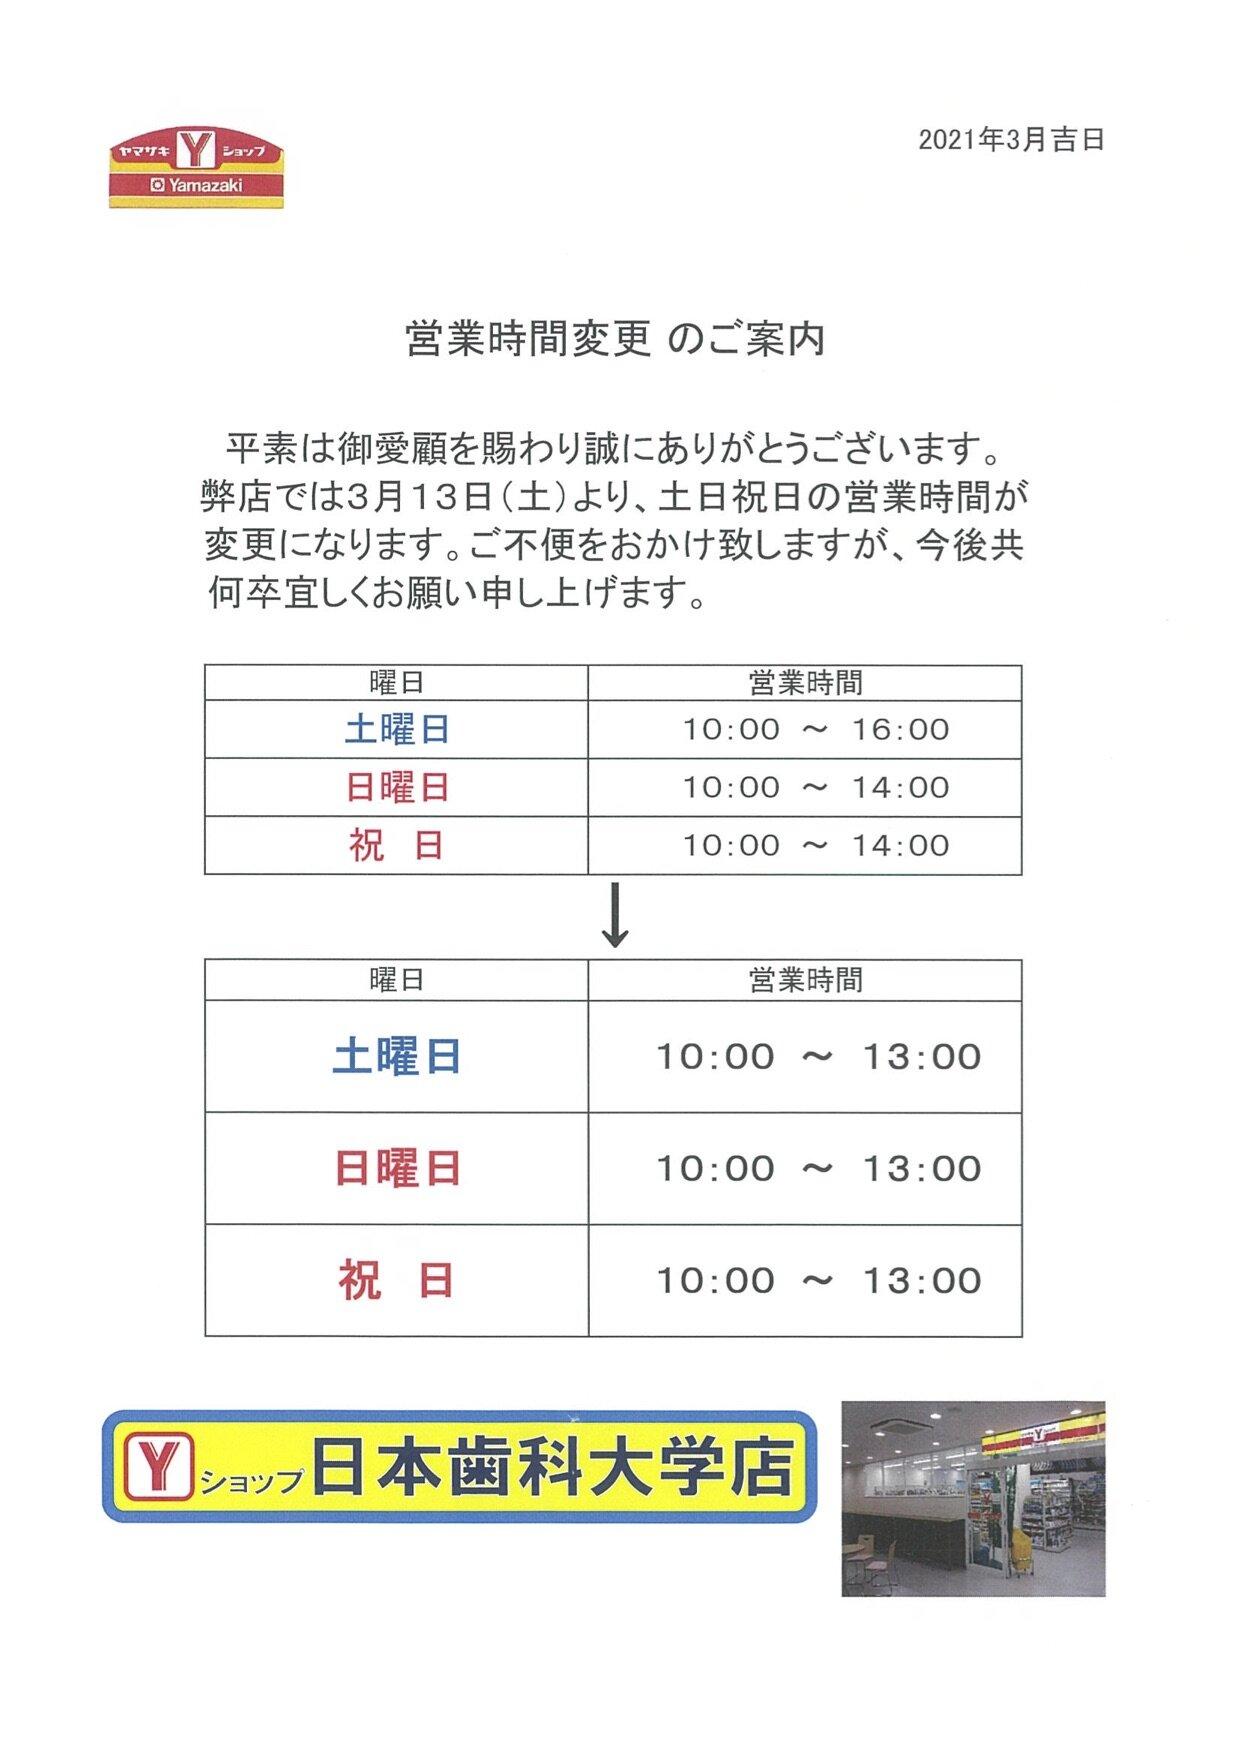 http://www.ngt.ndu.ac.jp/hospital/dental/info/669eacd13be7a747aa77b0f5a3a9b71cfa9fb53d.jpg